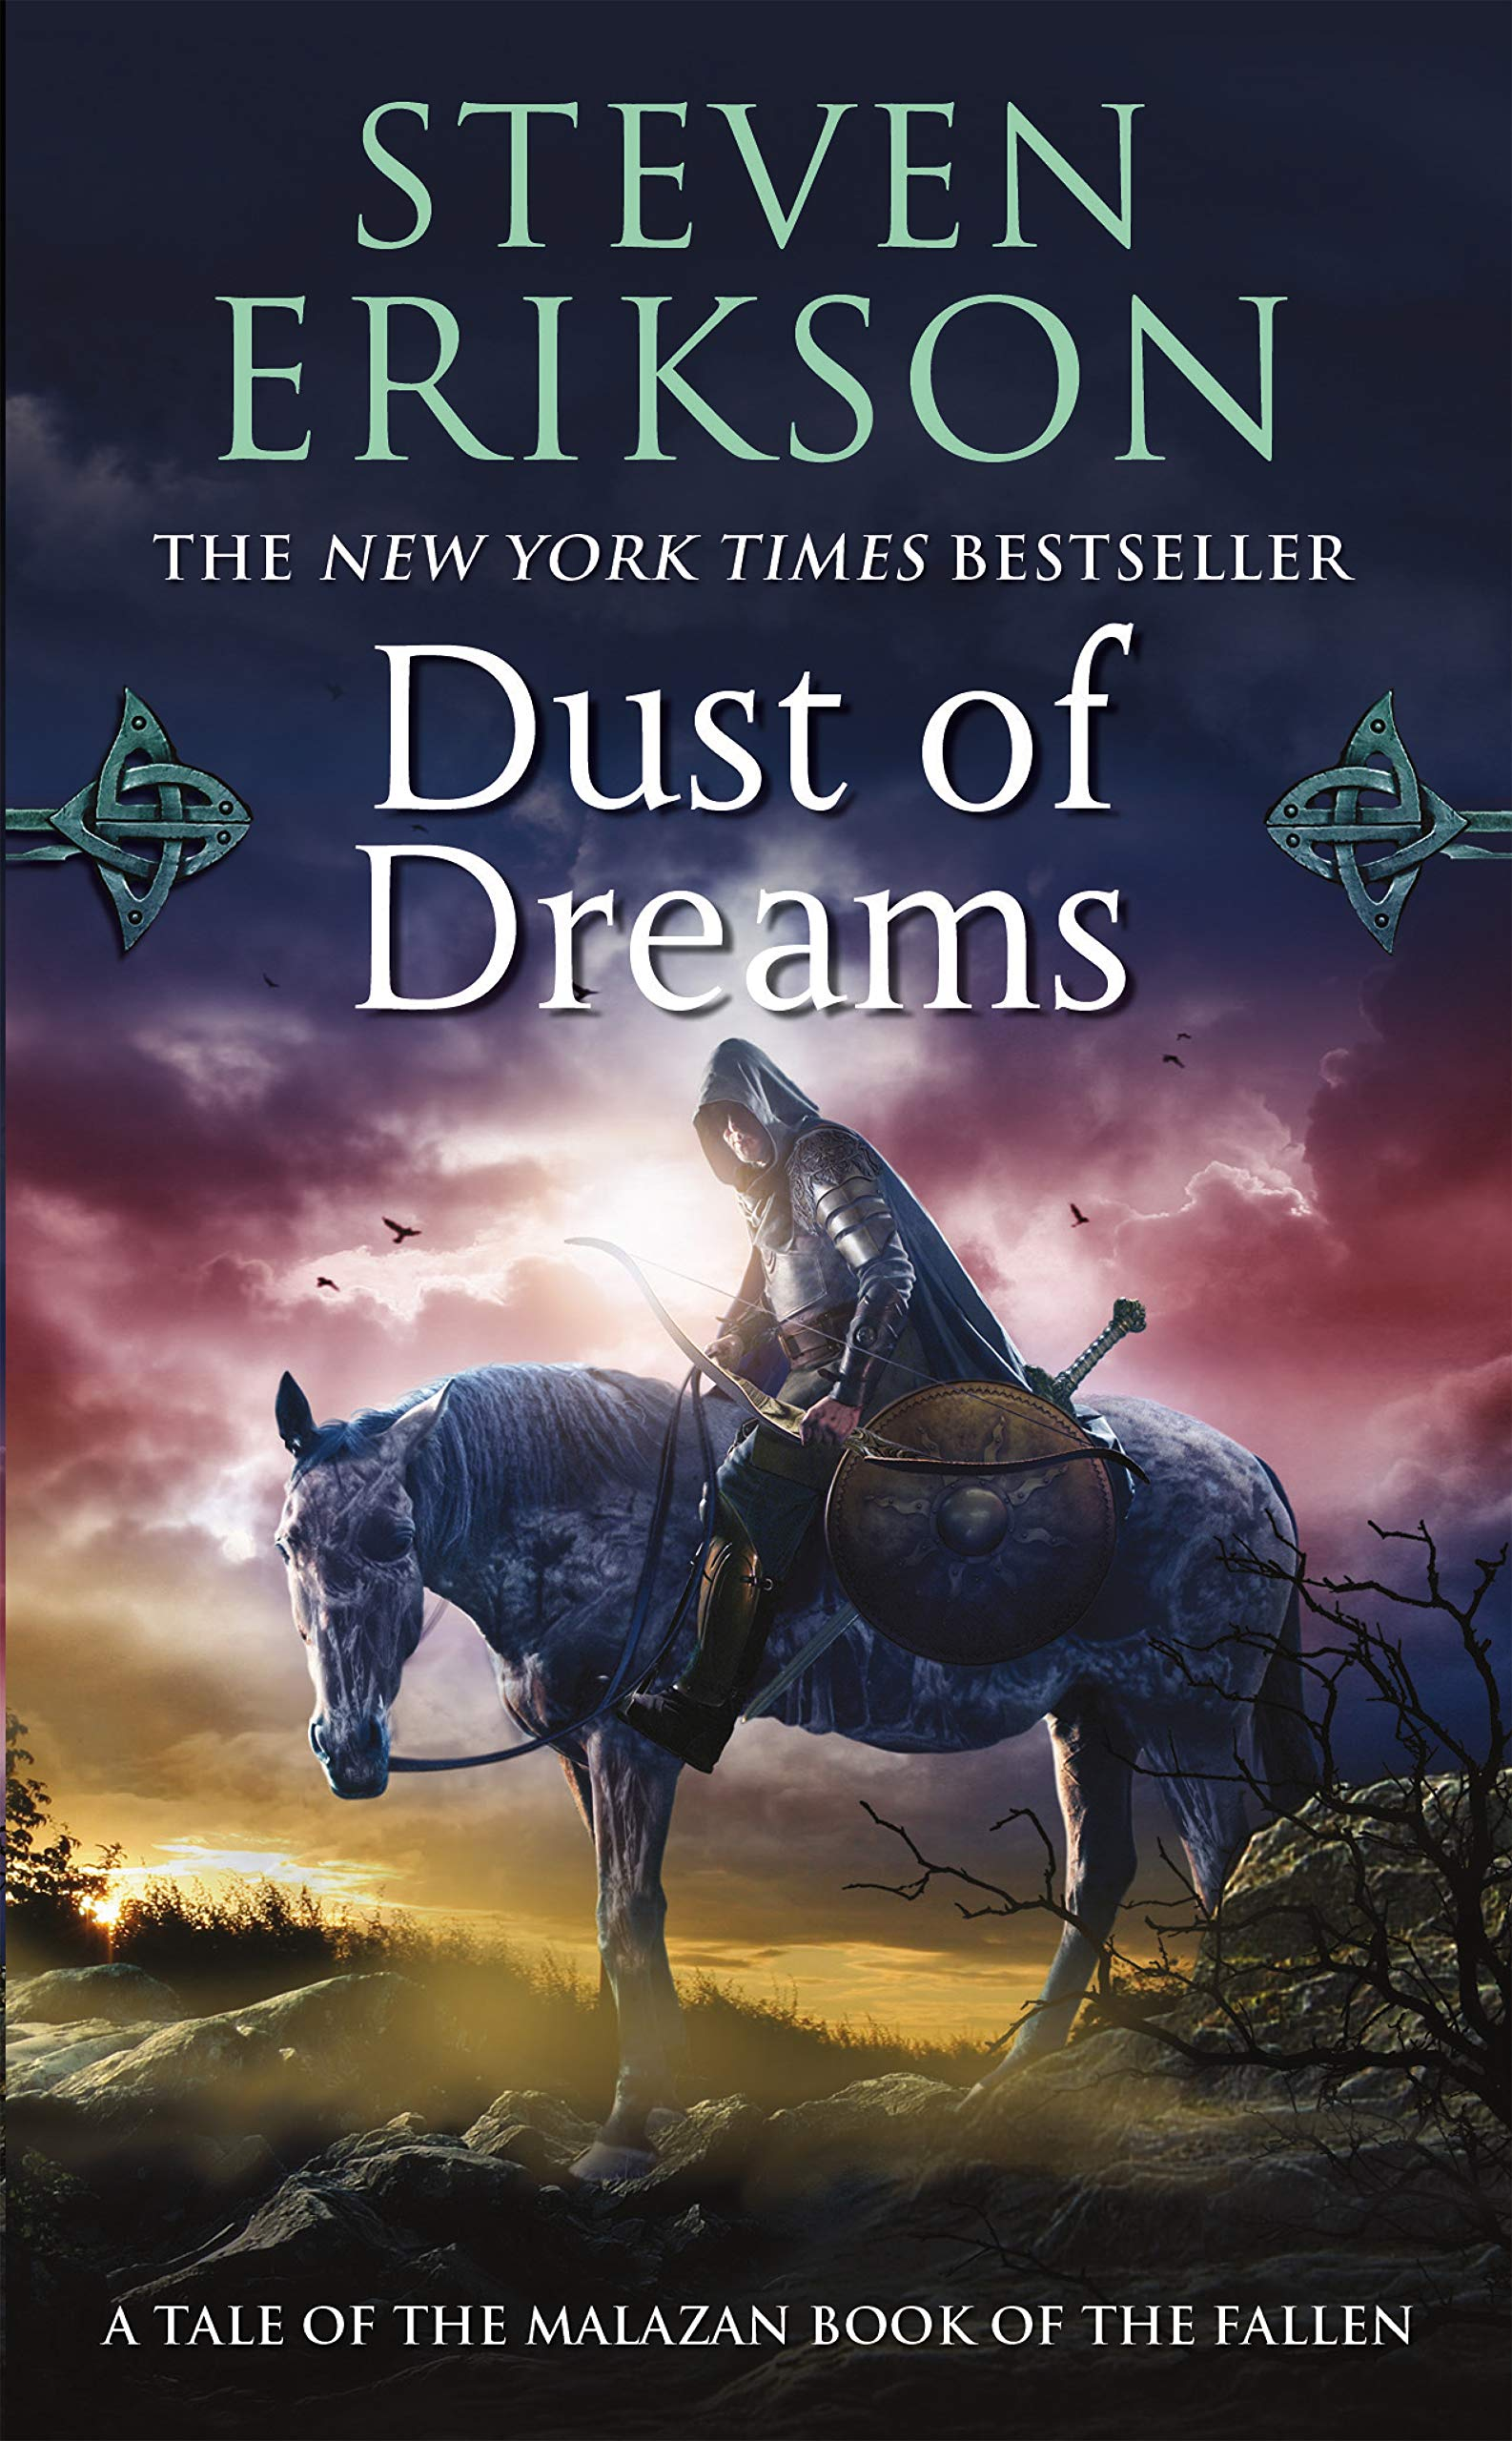 Dust of Dreams: Book Nine of The Malazan Book of the Fallen (Malazan Book  of the Fallen (9)): Erikson, Steven: 9780765348869: Amazon.com: Books